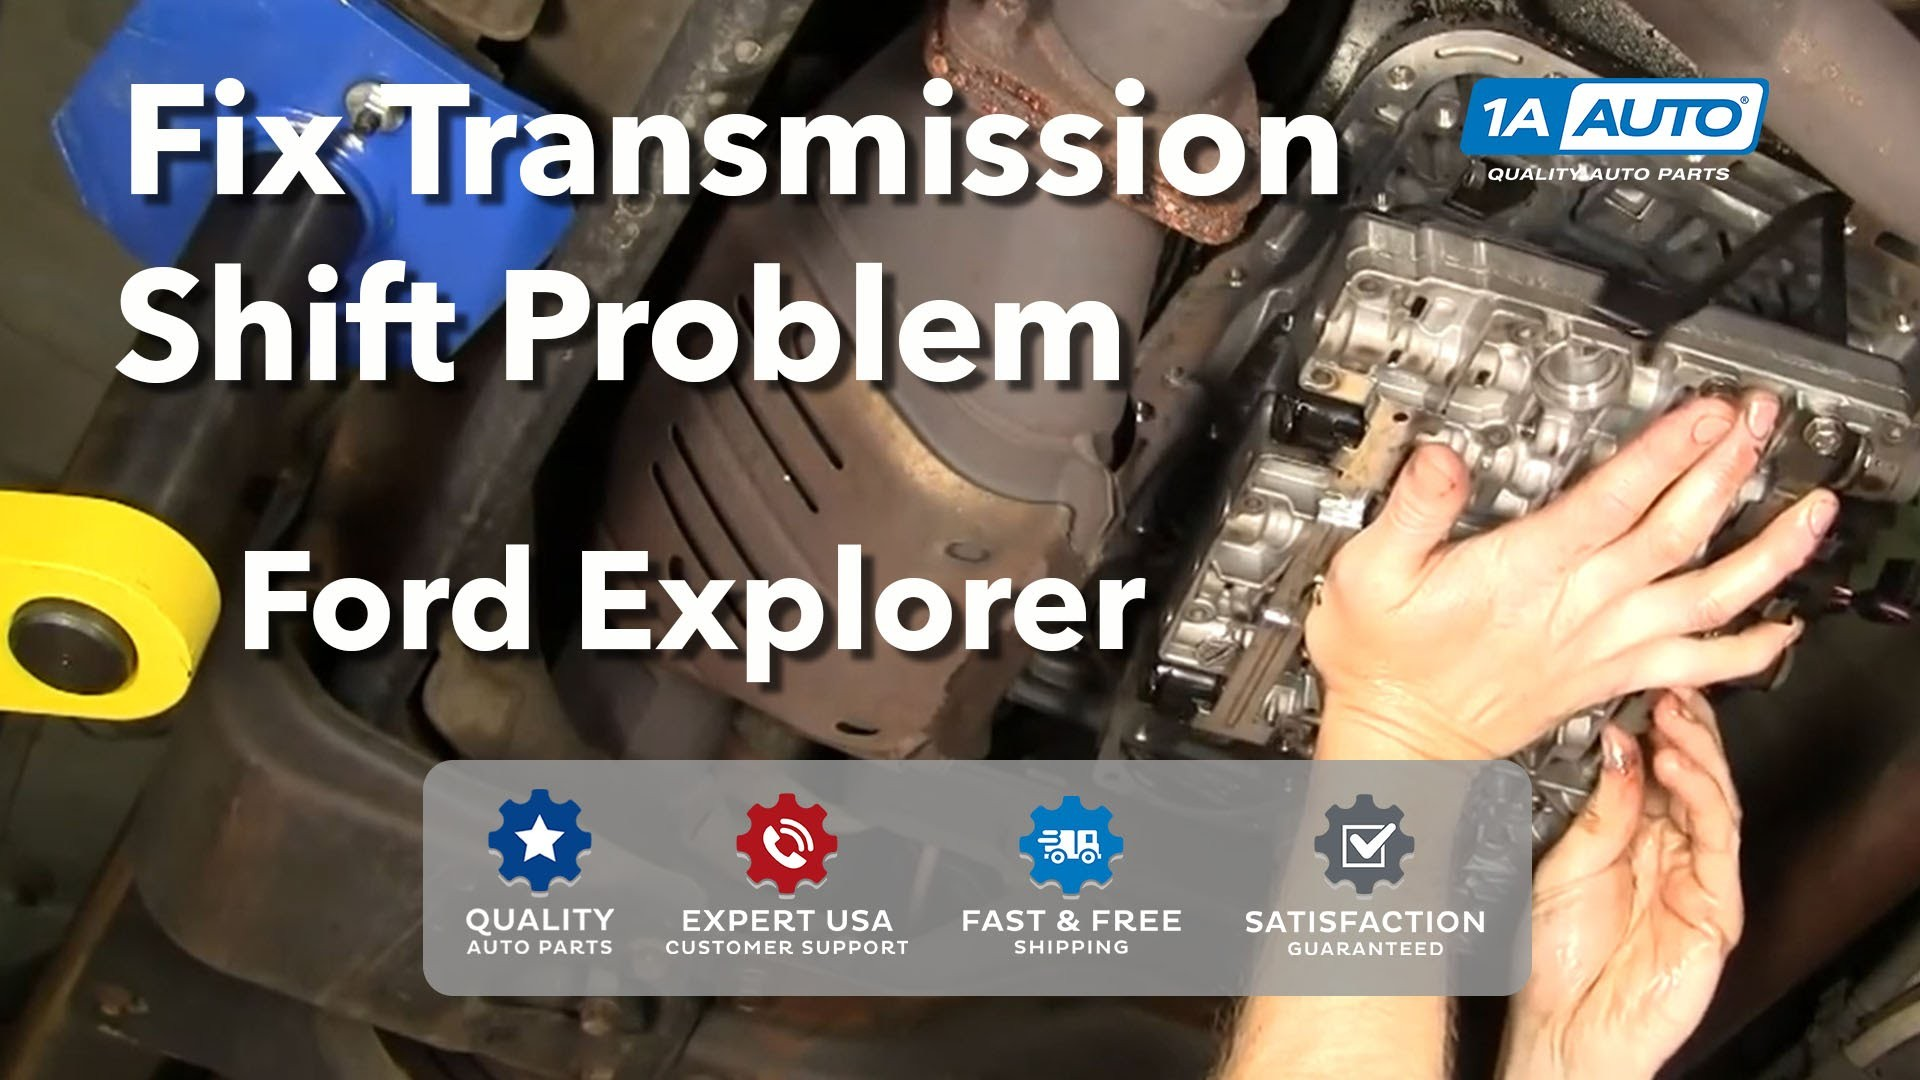 2002 ford Explorer Engine Diagram Auto Repair Fix Transmission Shift Problem ford 5r55e Explorer Buy Of 2002 ford Explorer Engine Diagram